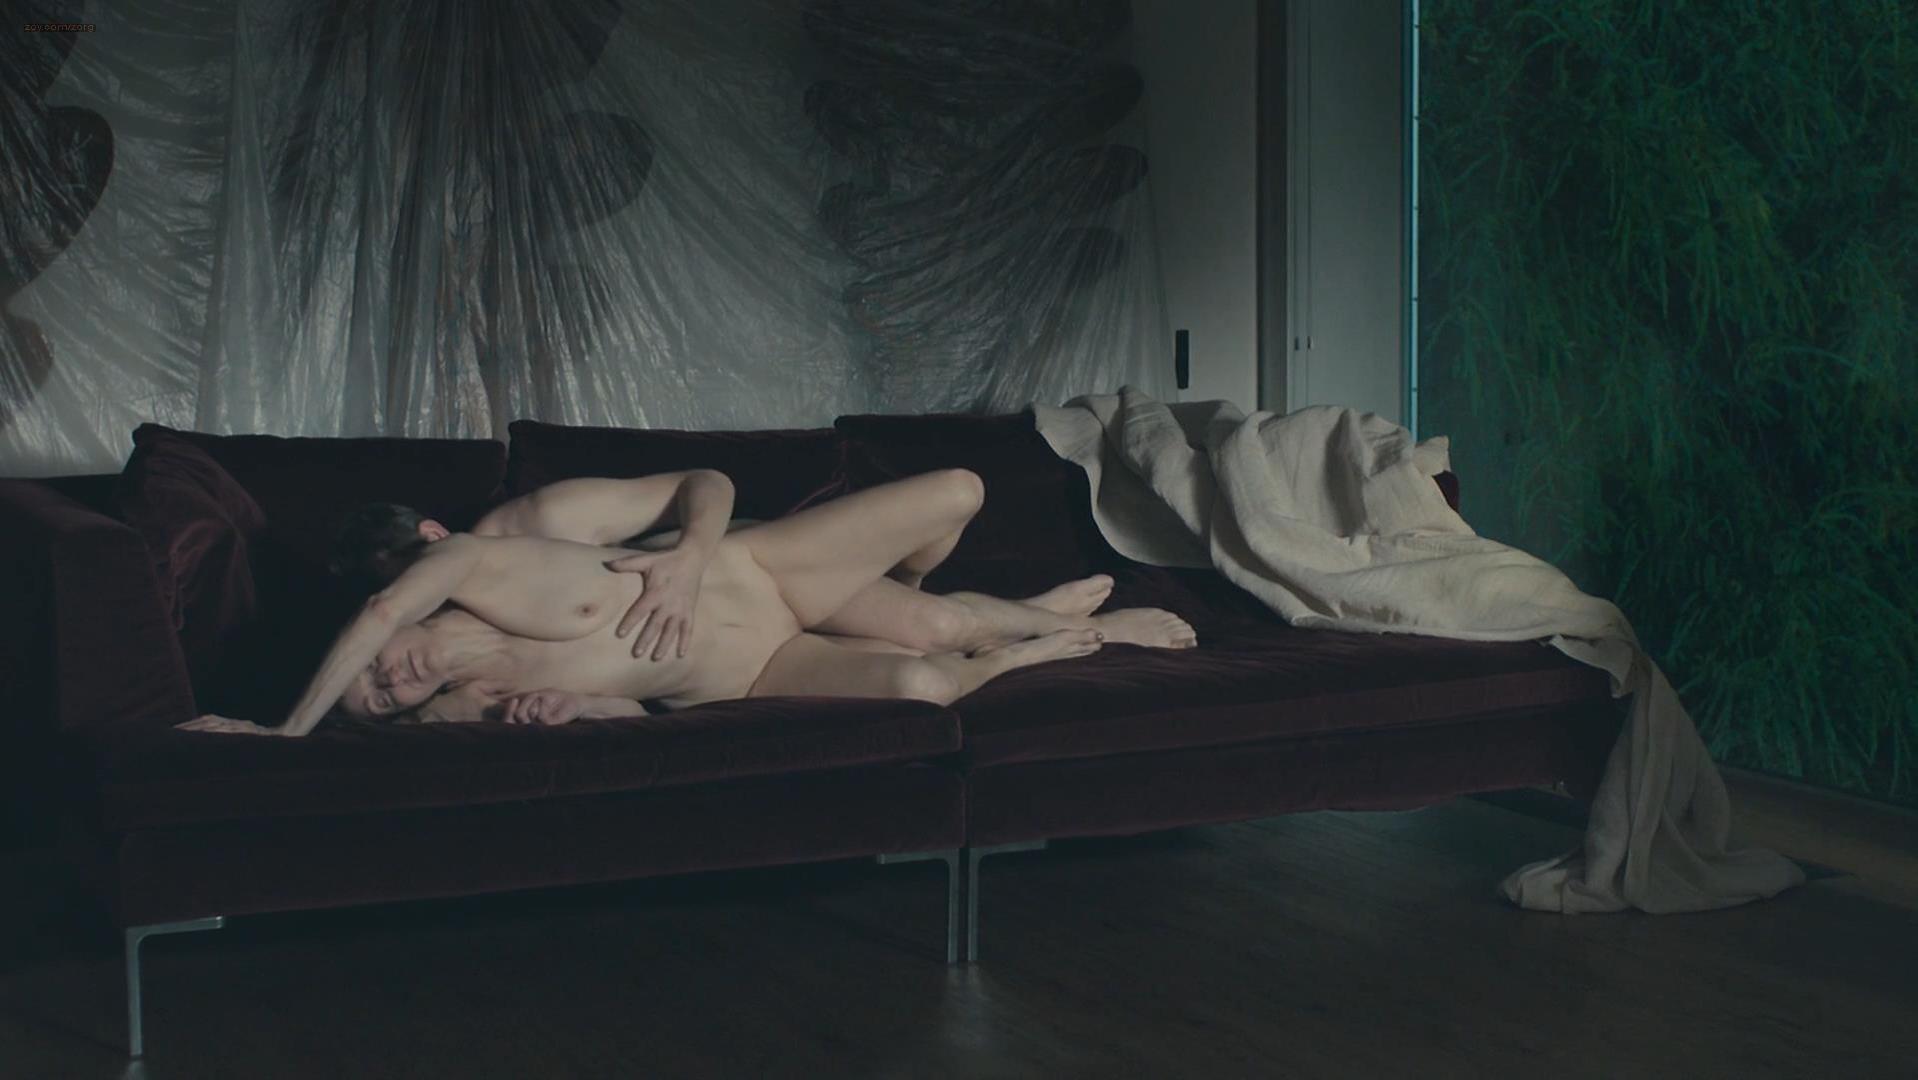 Viviane Albertine nude - Exhibition (2013)